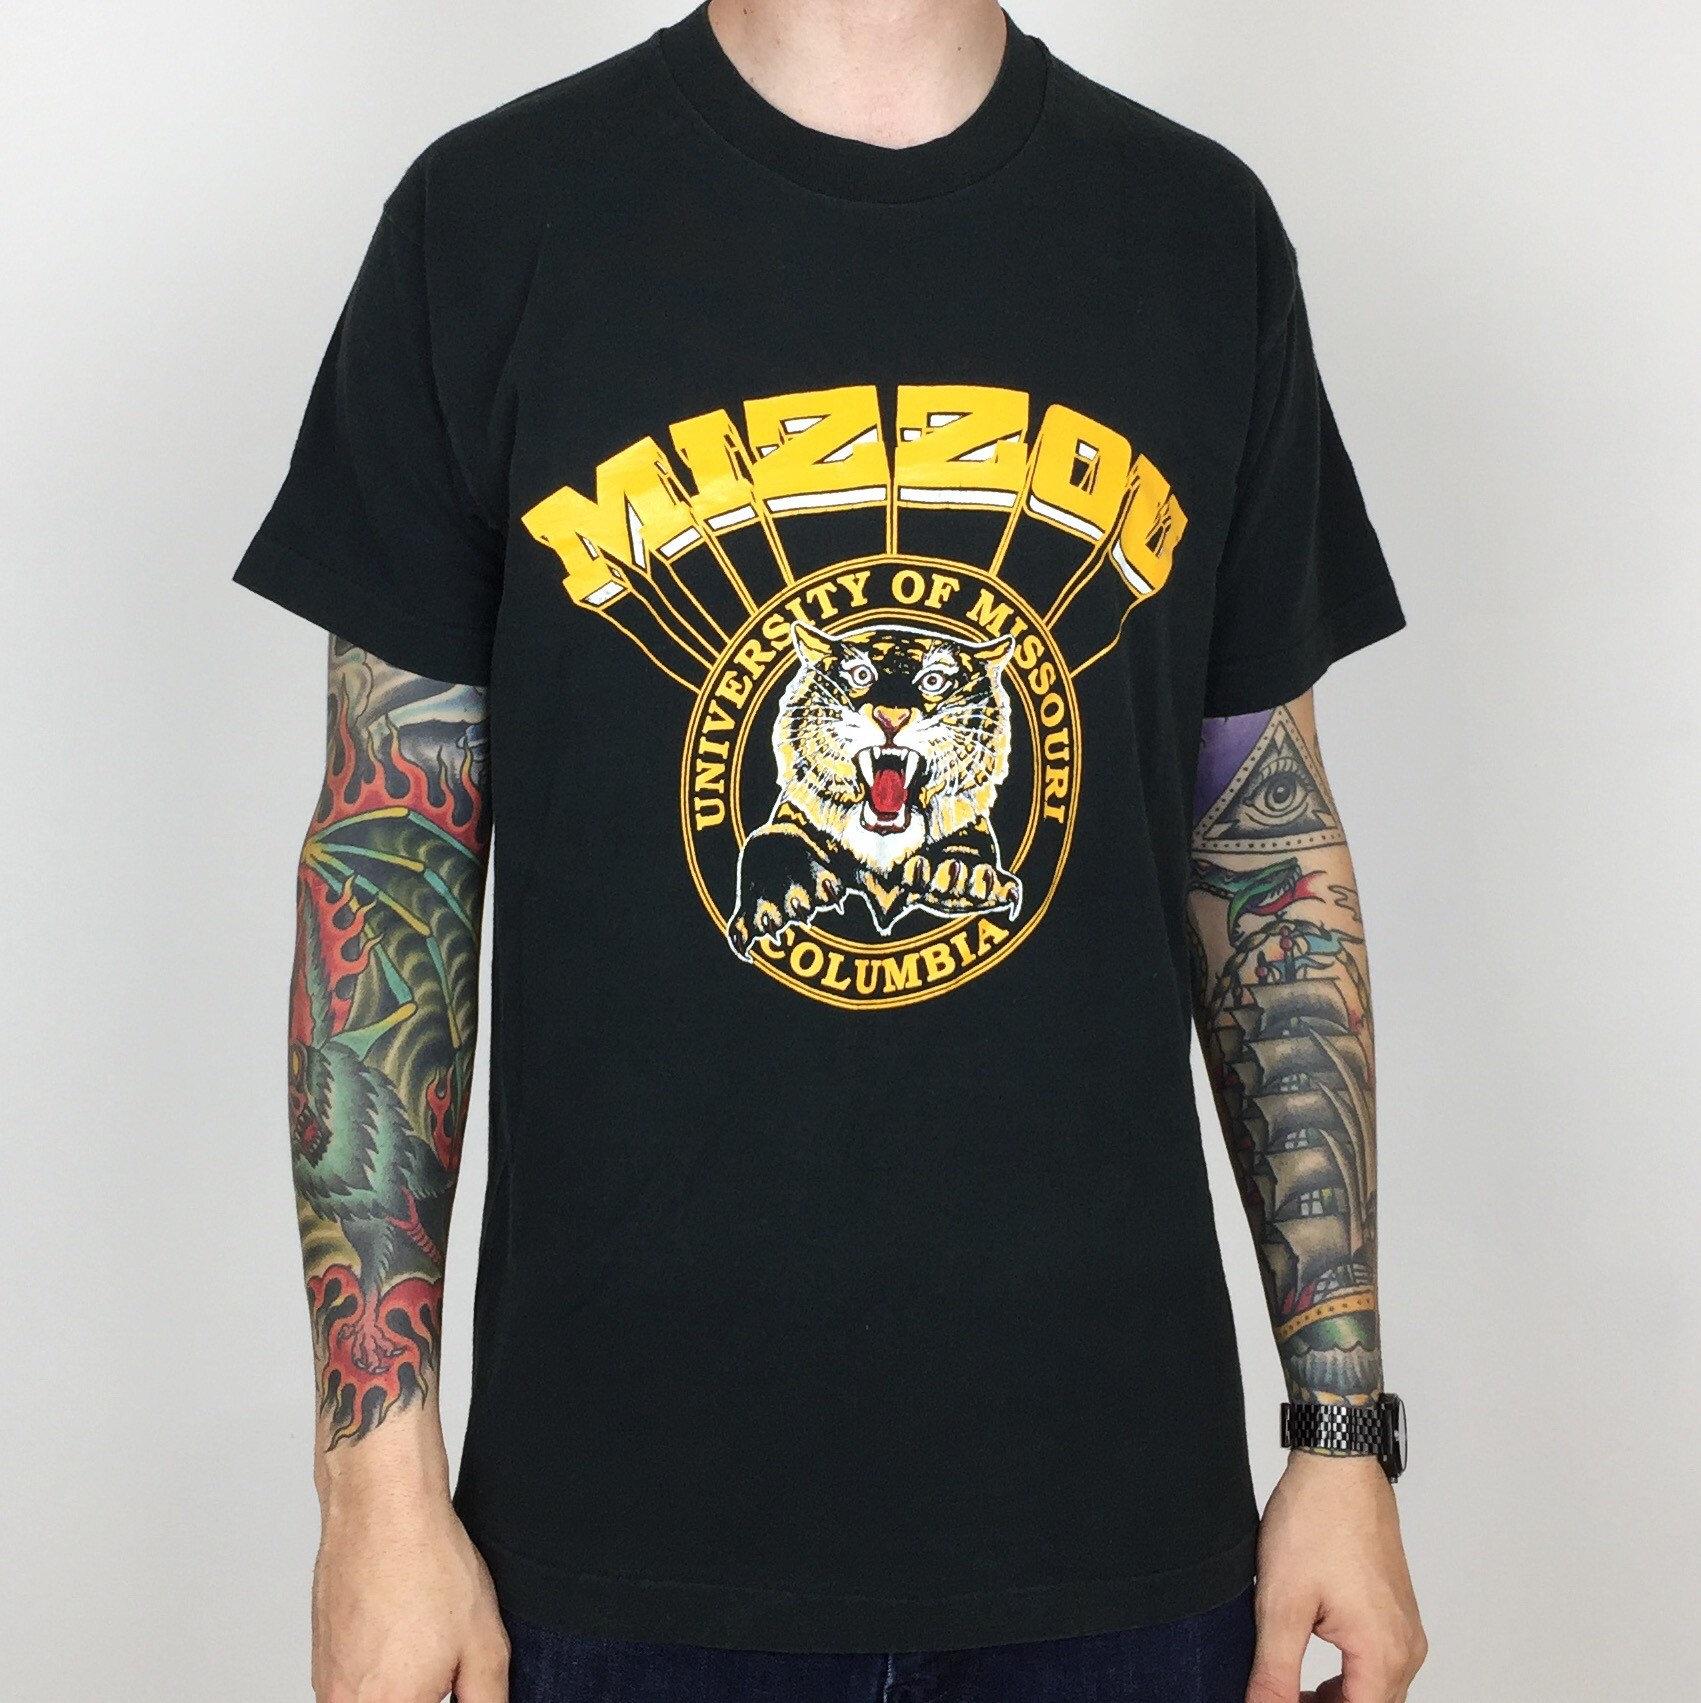 7bc26d06efe Vintage 90s NCAA University of Missouri Mizzou Tigers Columbia black single  stitch college graphic tee t-shirt shirt - Size M